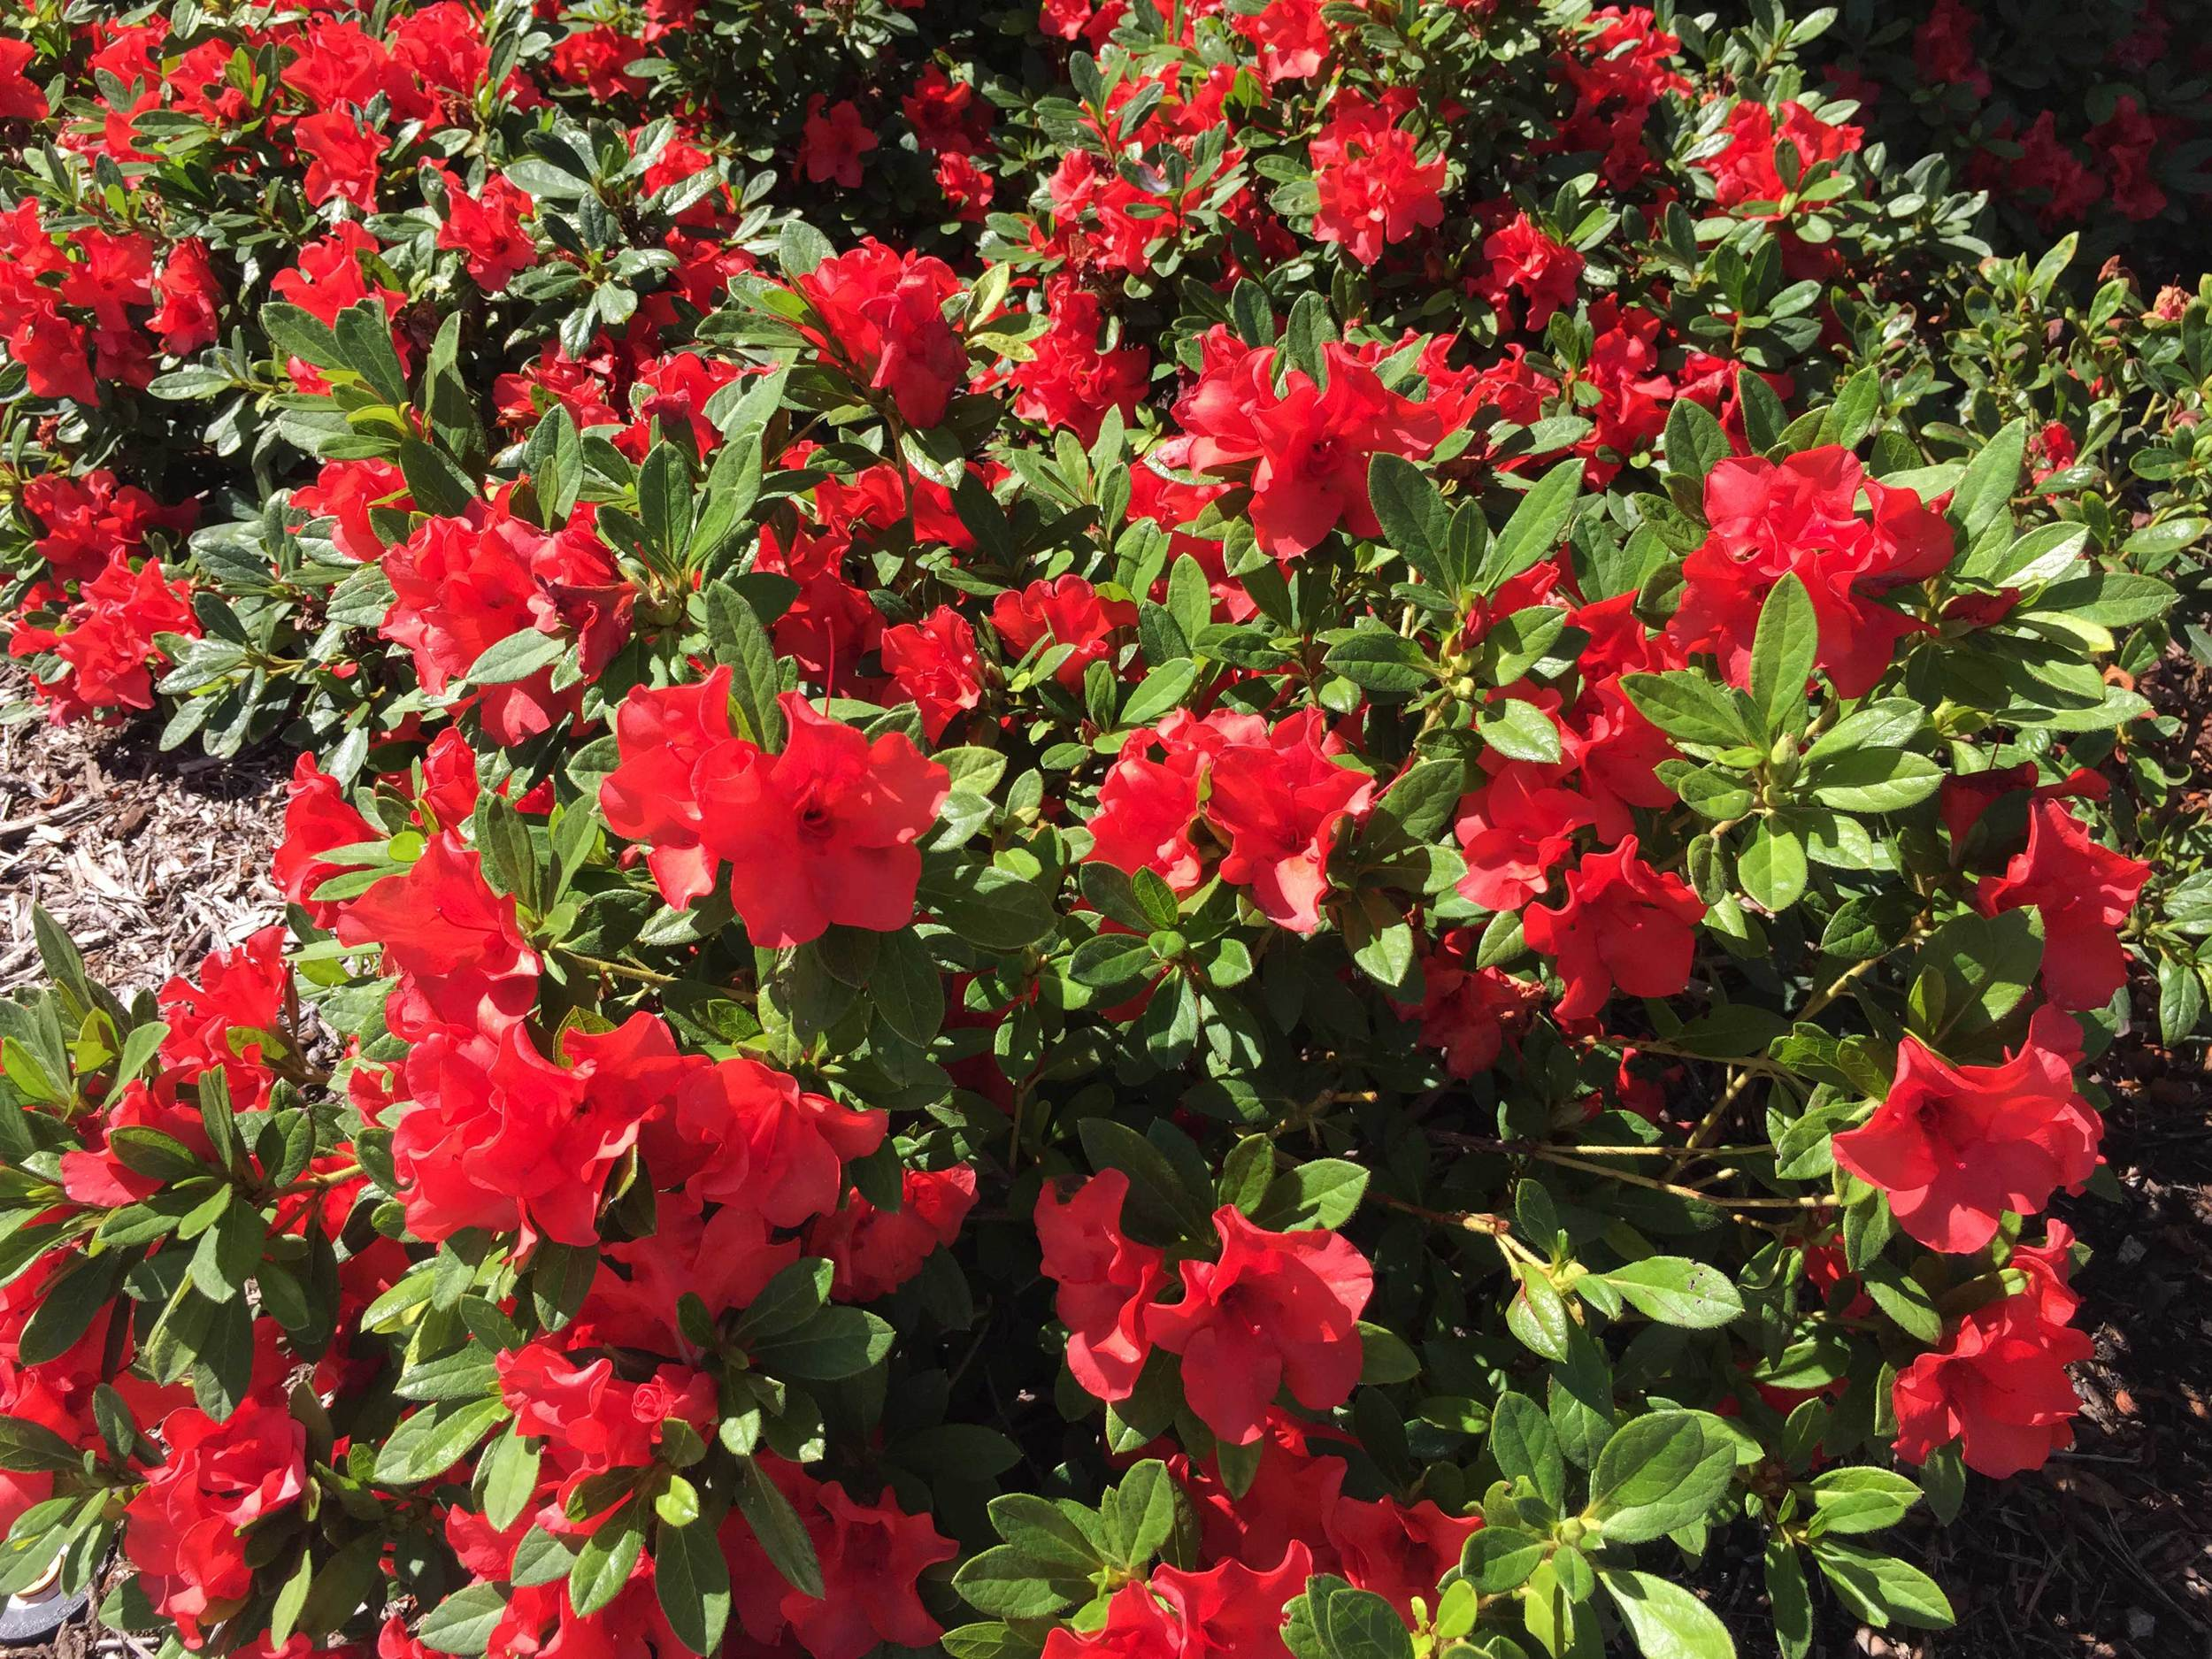 Encore Azalea 'Autumn Sunset' (Azalea x 'Roblen PP#16248)  - A medium height evergreen shrub with red blooms into fall.